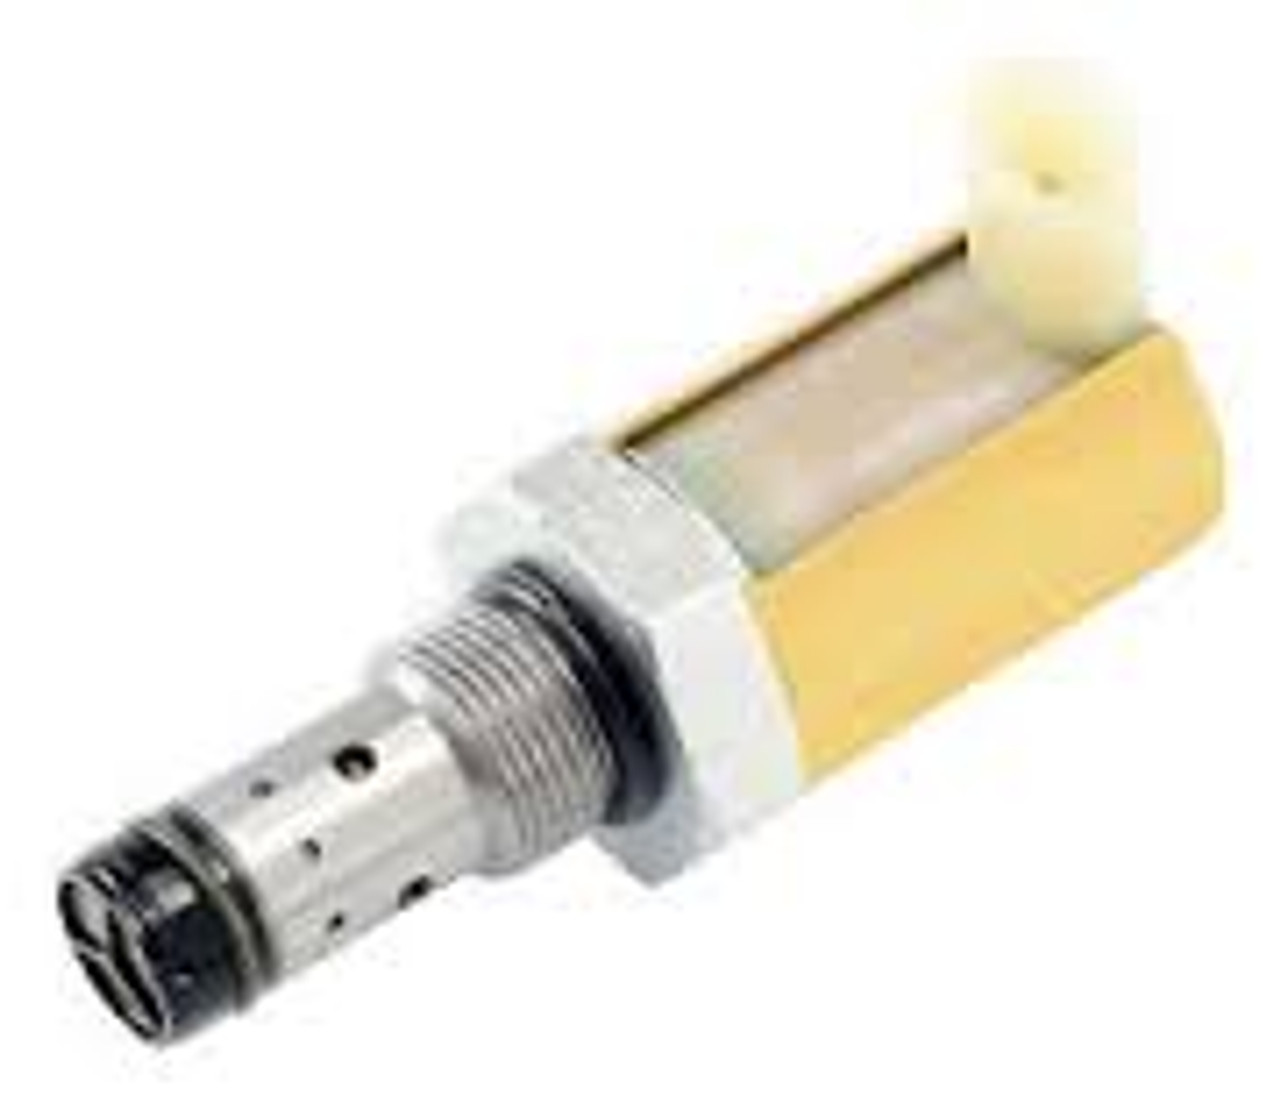 6.0 Powerstroke Injection Pressure Regulator Early